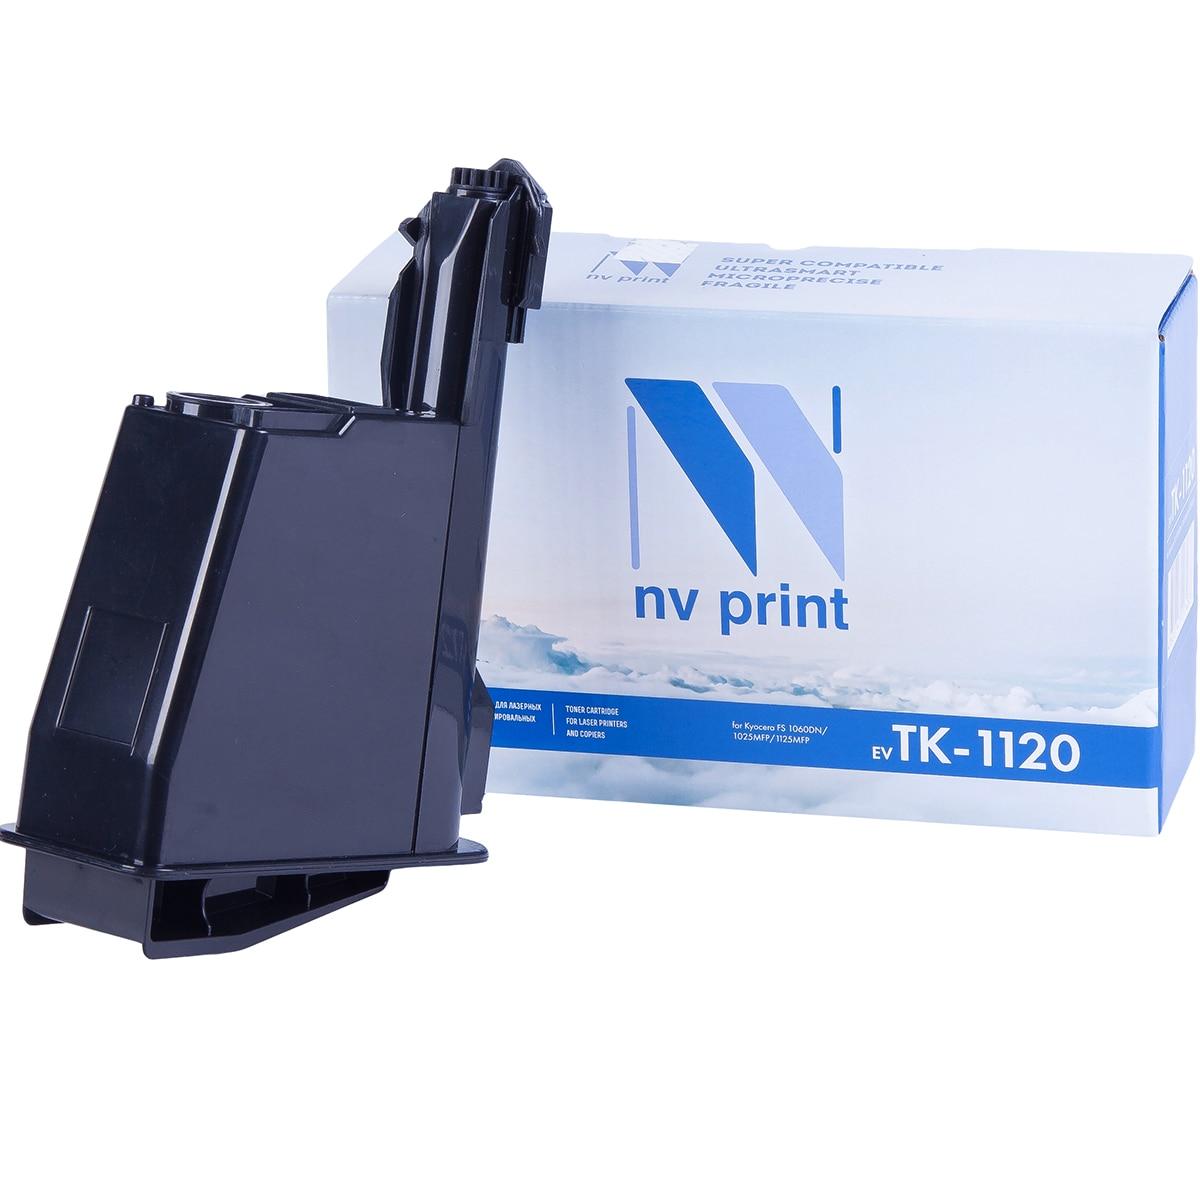 Картридж NV Print совместимый TK-1120 для Kyocera FS-1060DN/1025MFP/1125MFP, 3000к